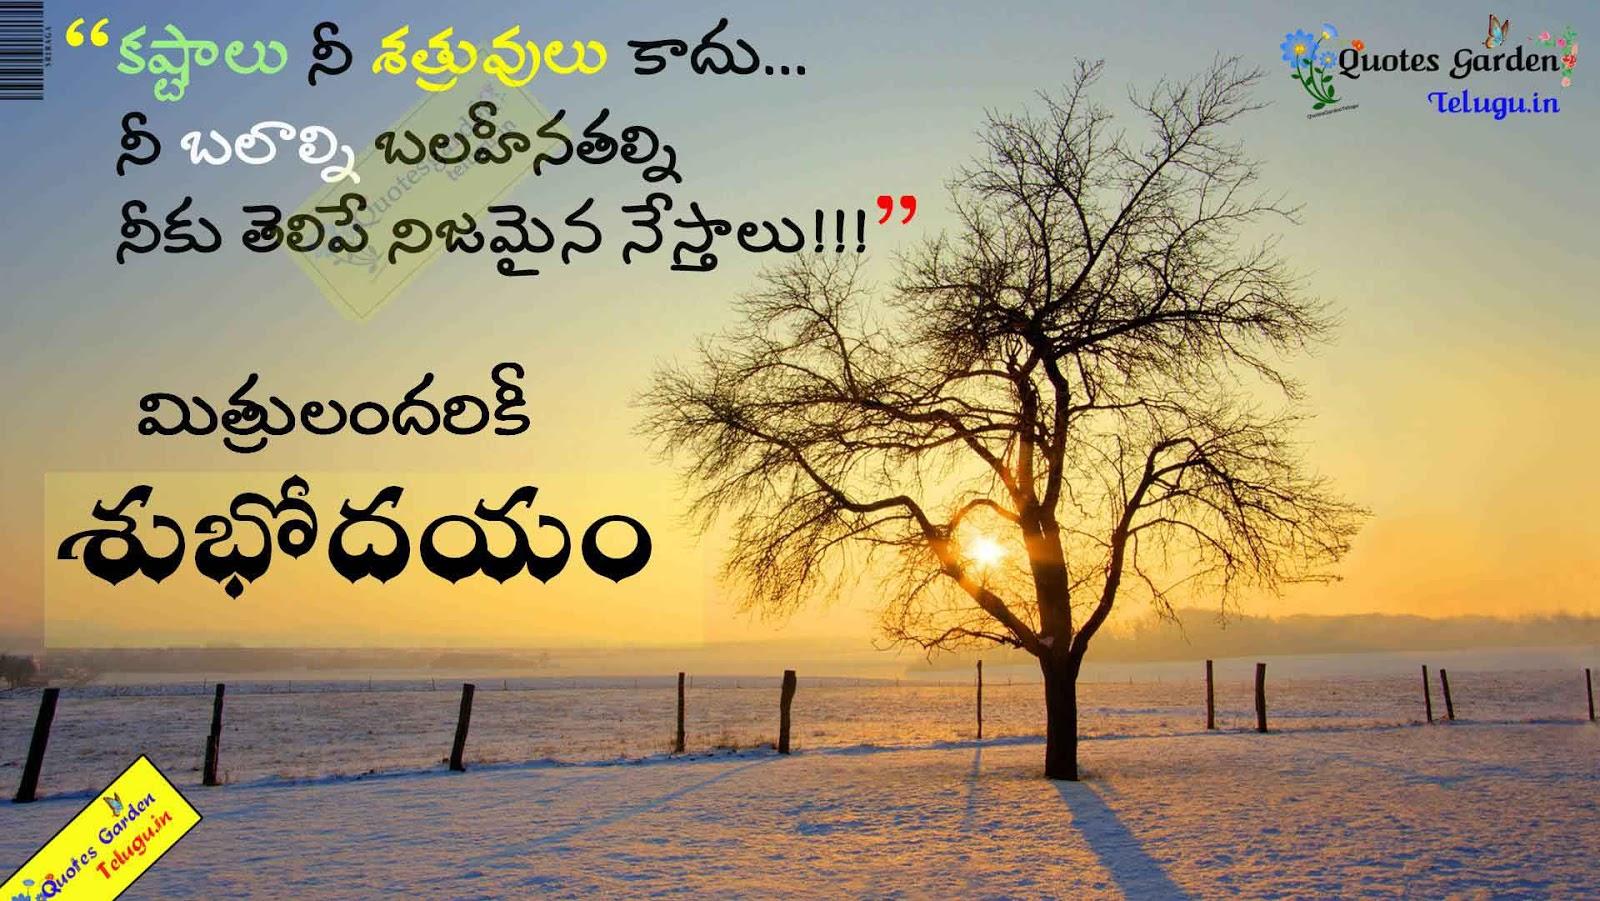 Best good morning greetings in telugu with quotes hd wallpapers best good morning greetings in telugu with quotes hd wallpapers 807 kristyandbryce Images